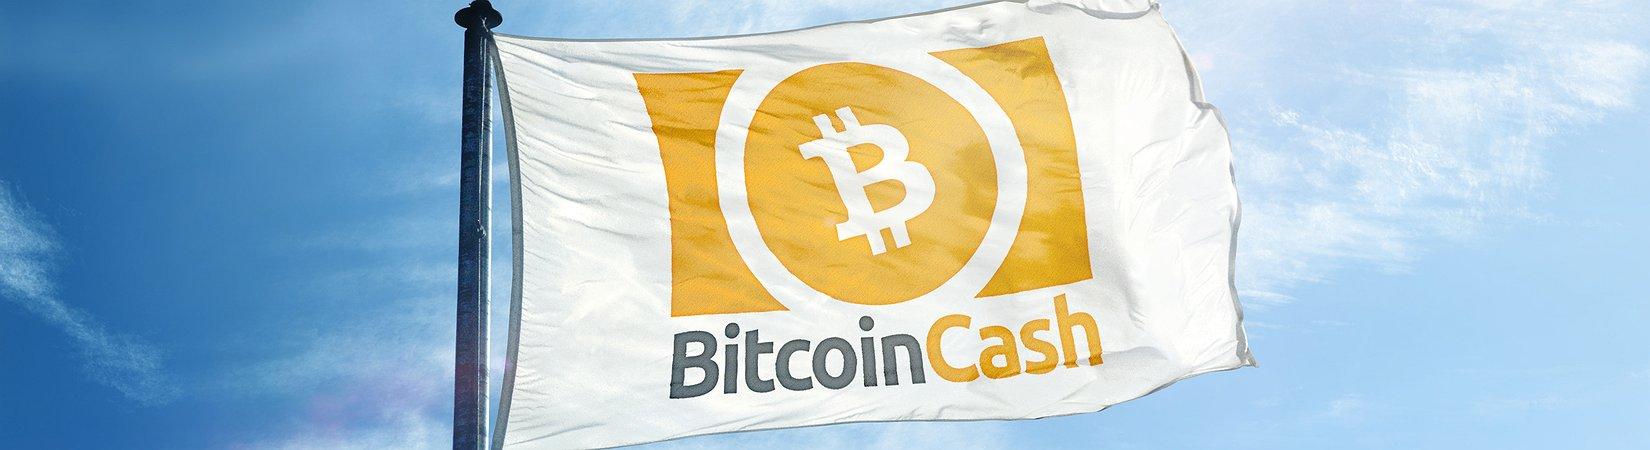 Coinbase запустила и остановила торги Bitcoin Cash после резкого скачка курса